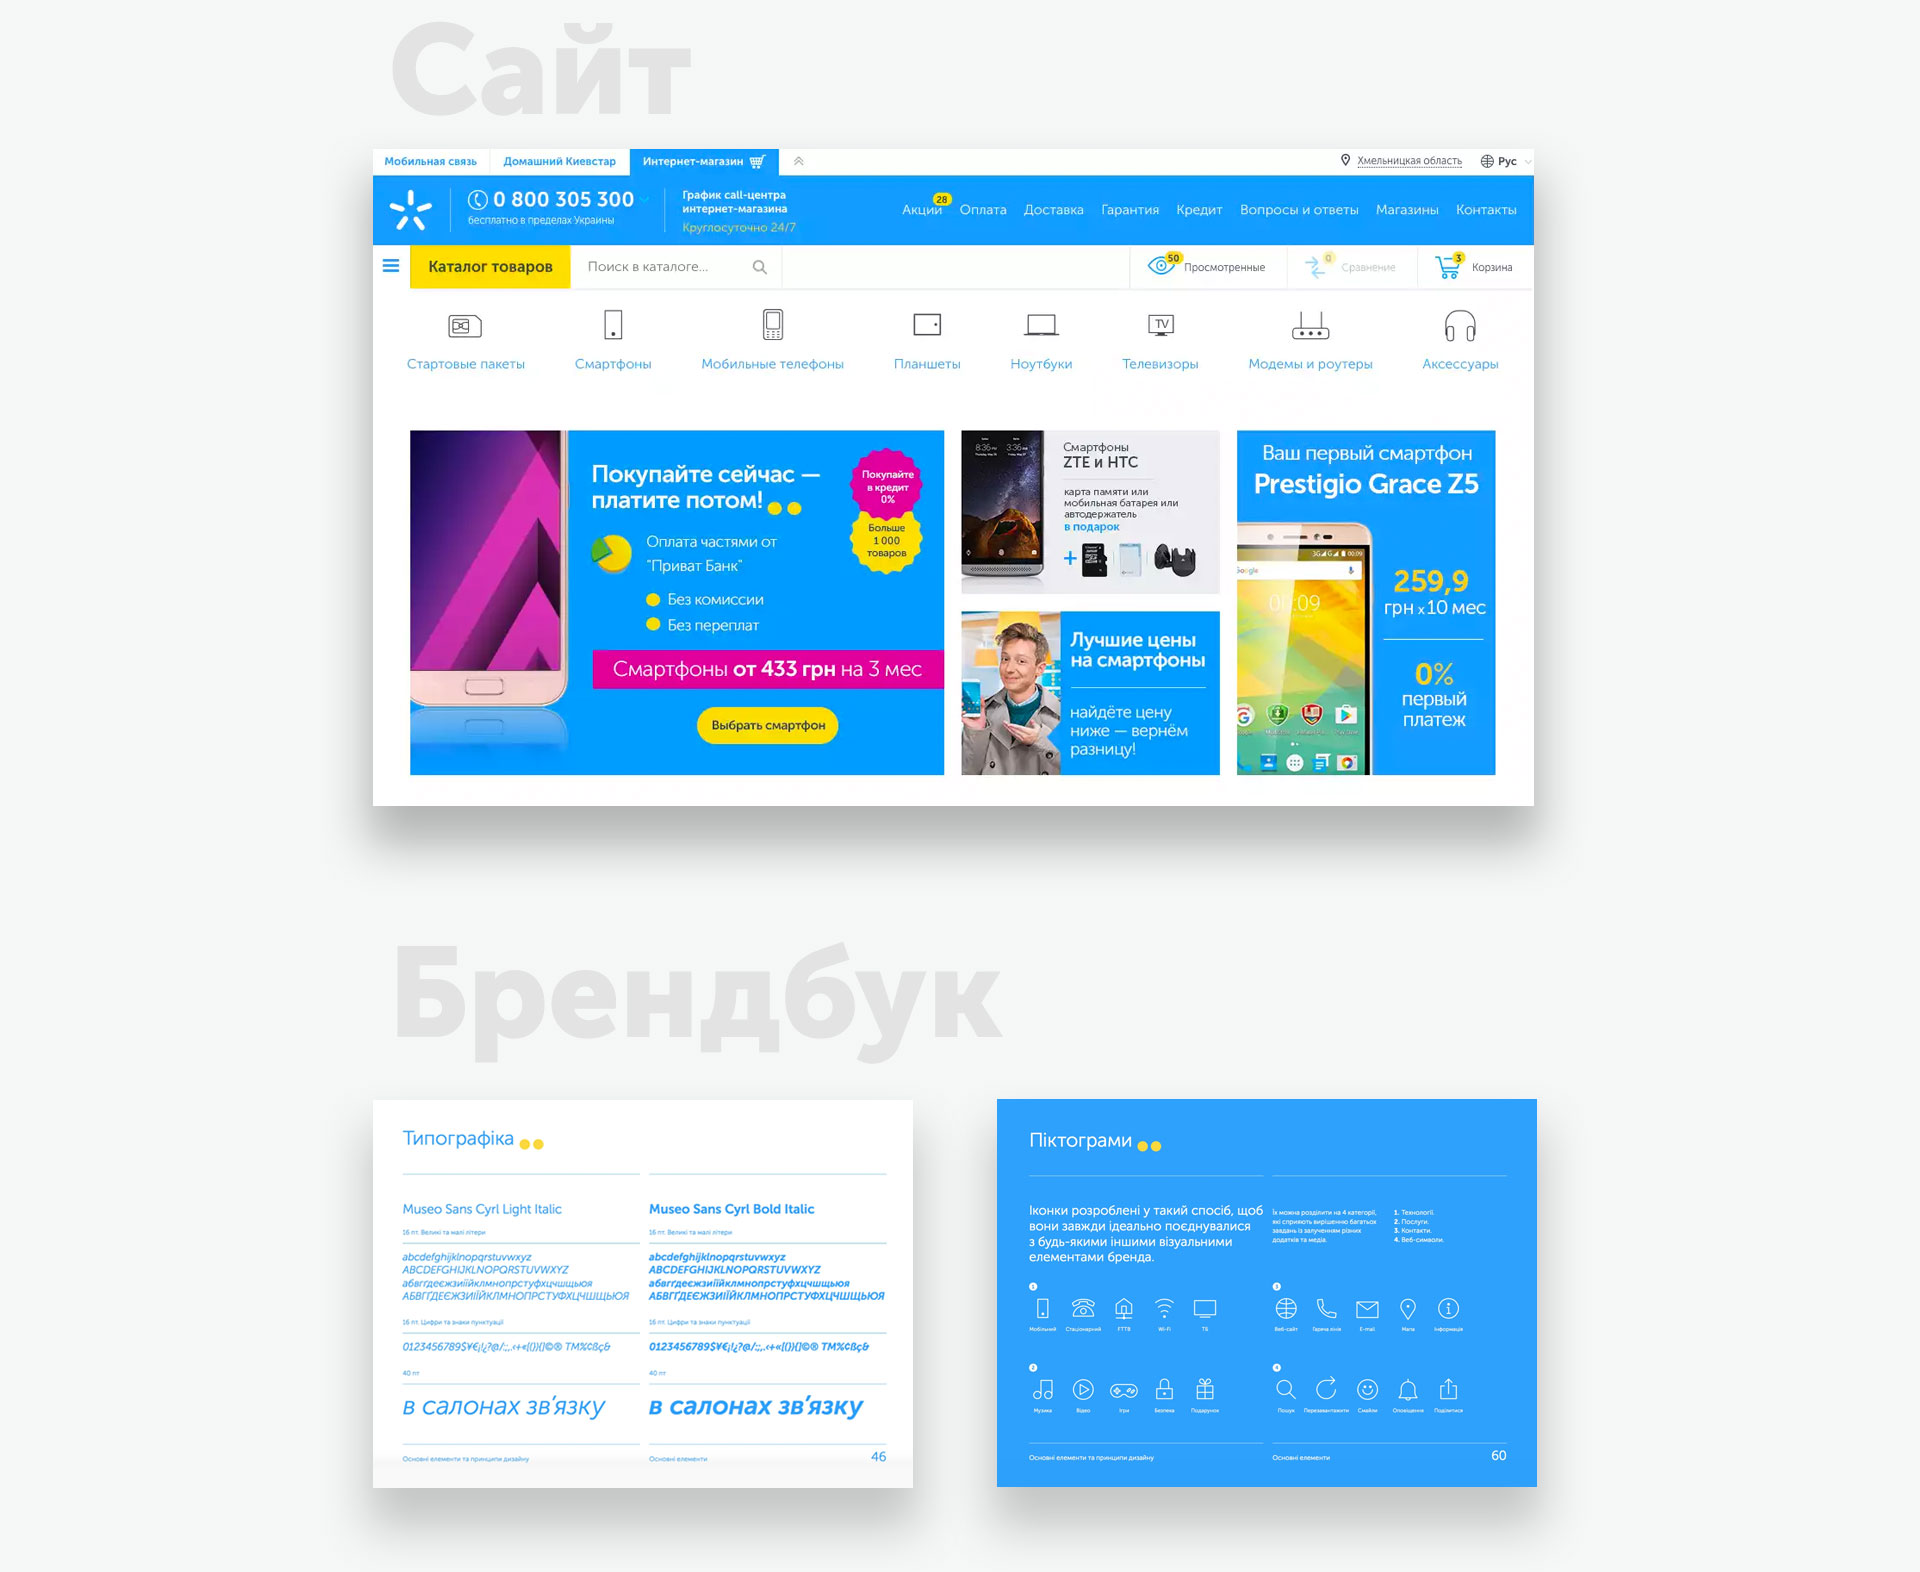 How to call Kyivstar operator